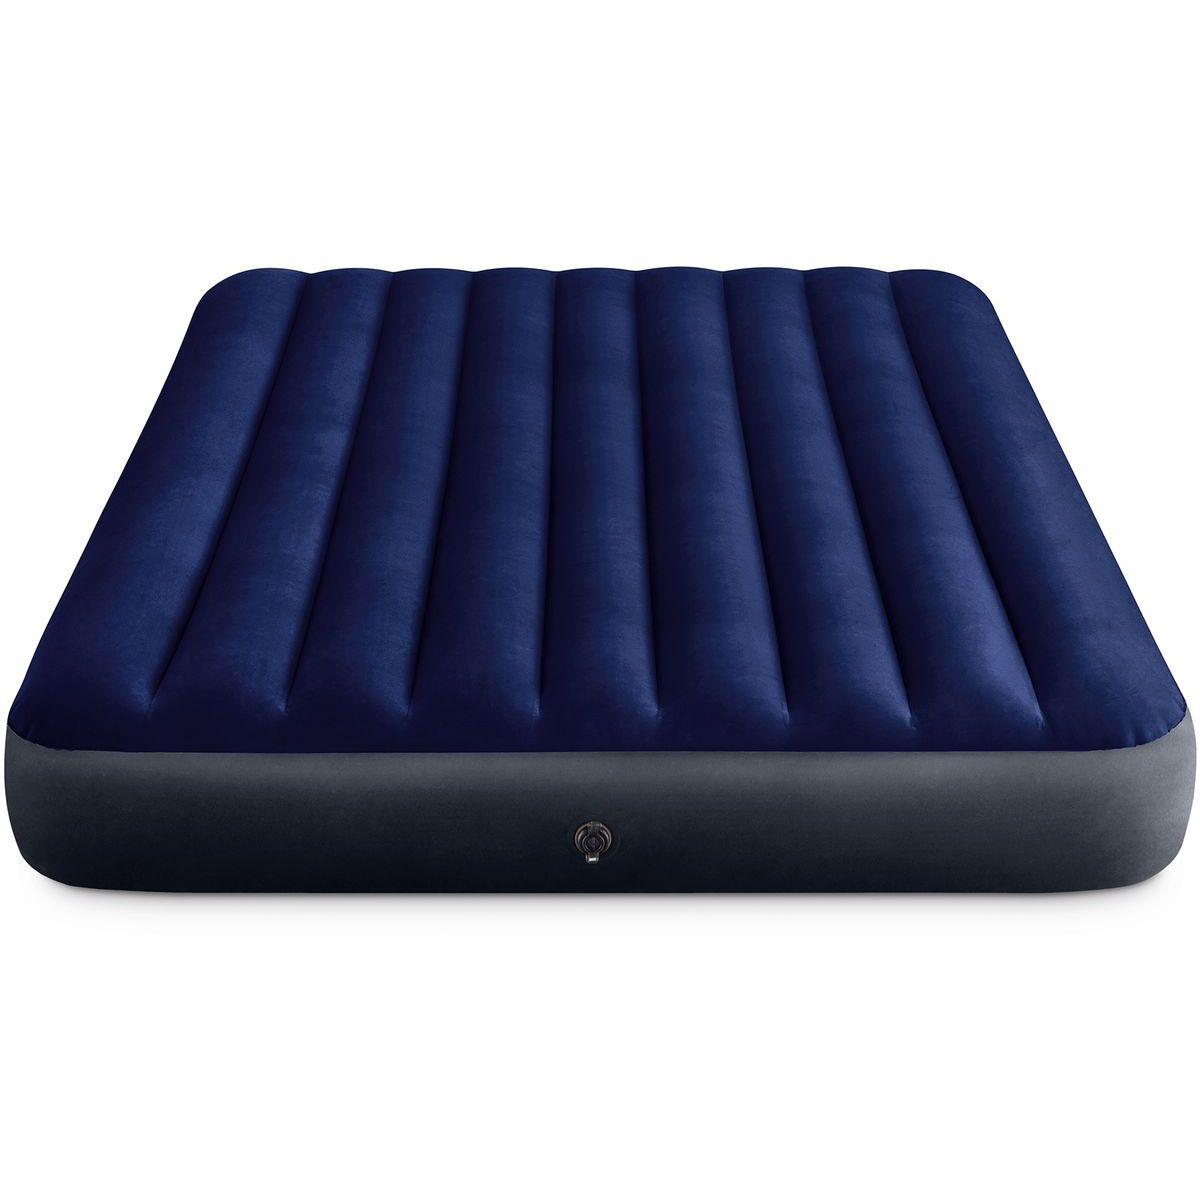 Intex 64759 Nafukovacia posteľ Standard Queen 152 cm x 203 cm